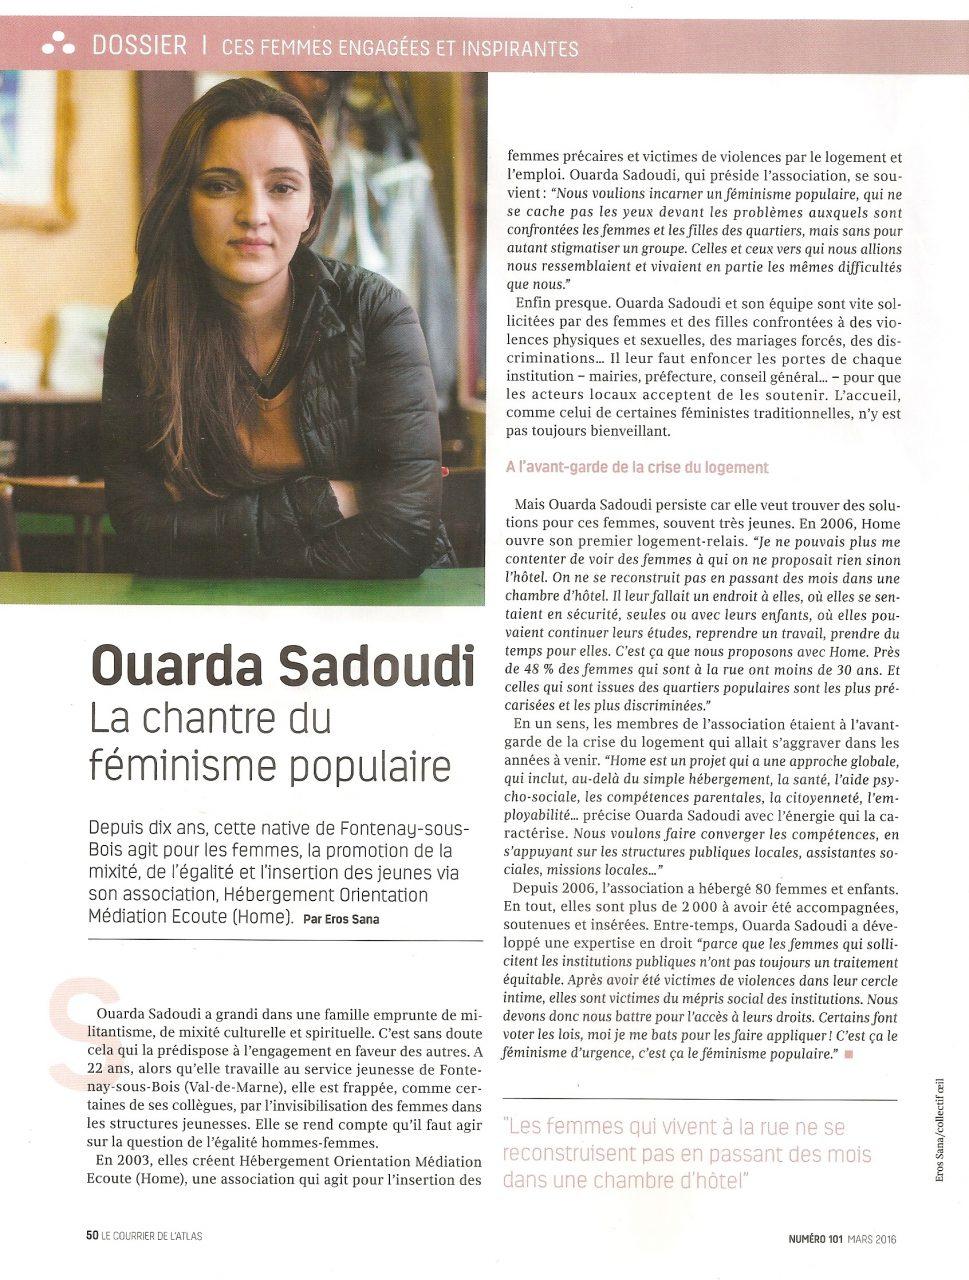 Ouarda Sadoudi